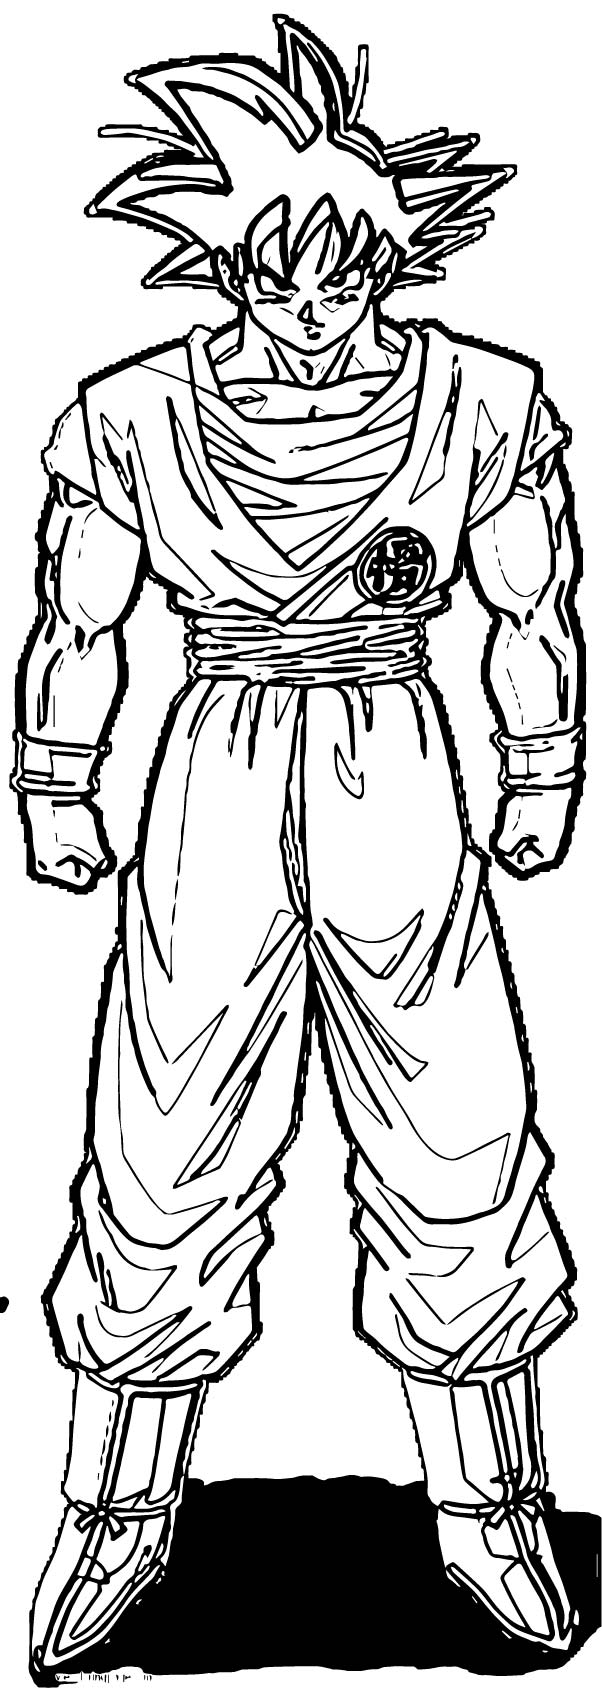 Goku We Coloring Page 289